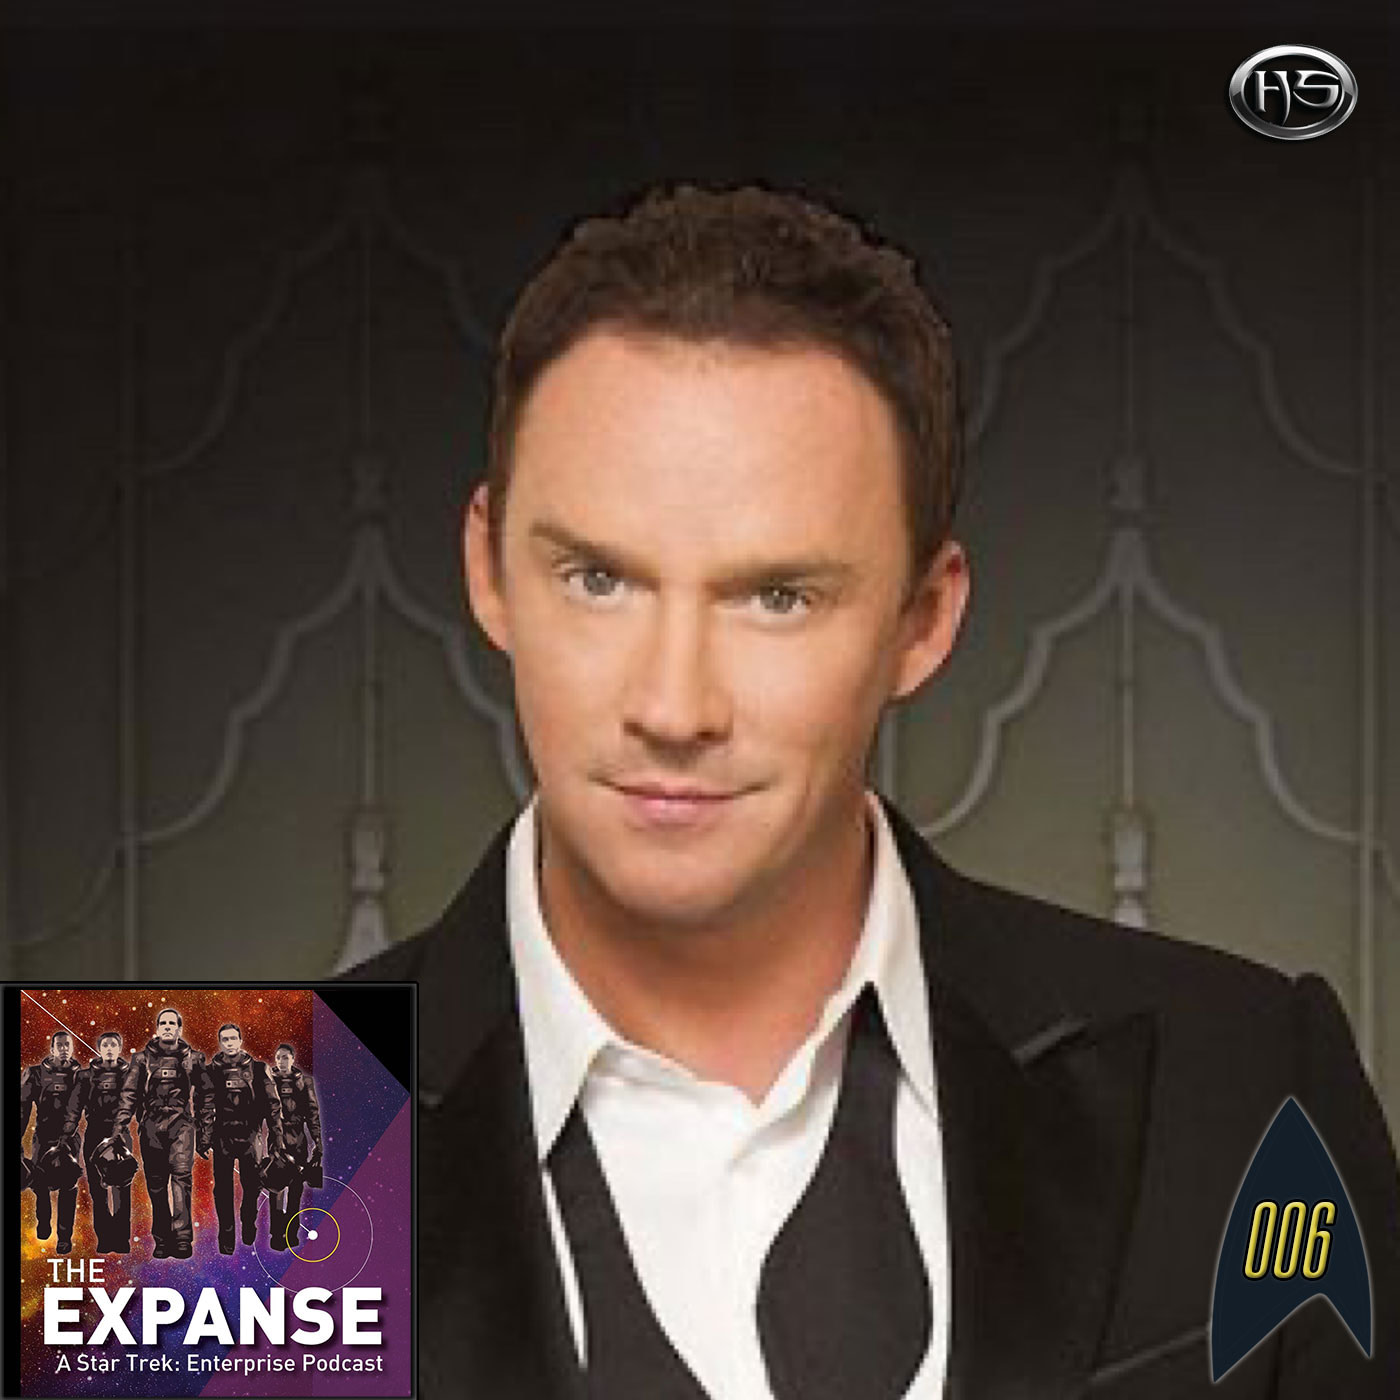 The Expanse Episode 6